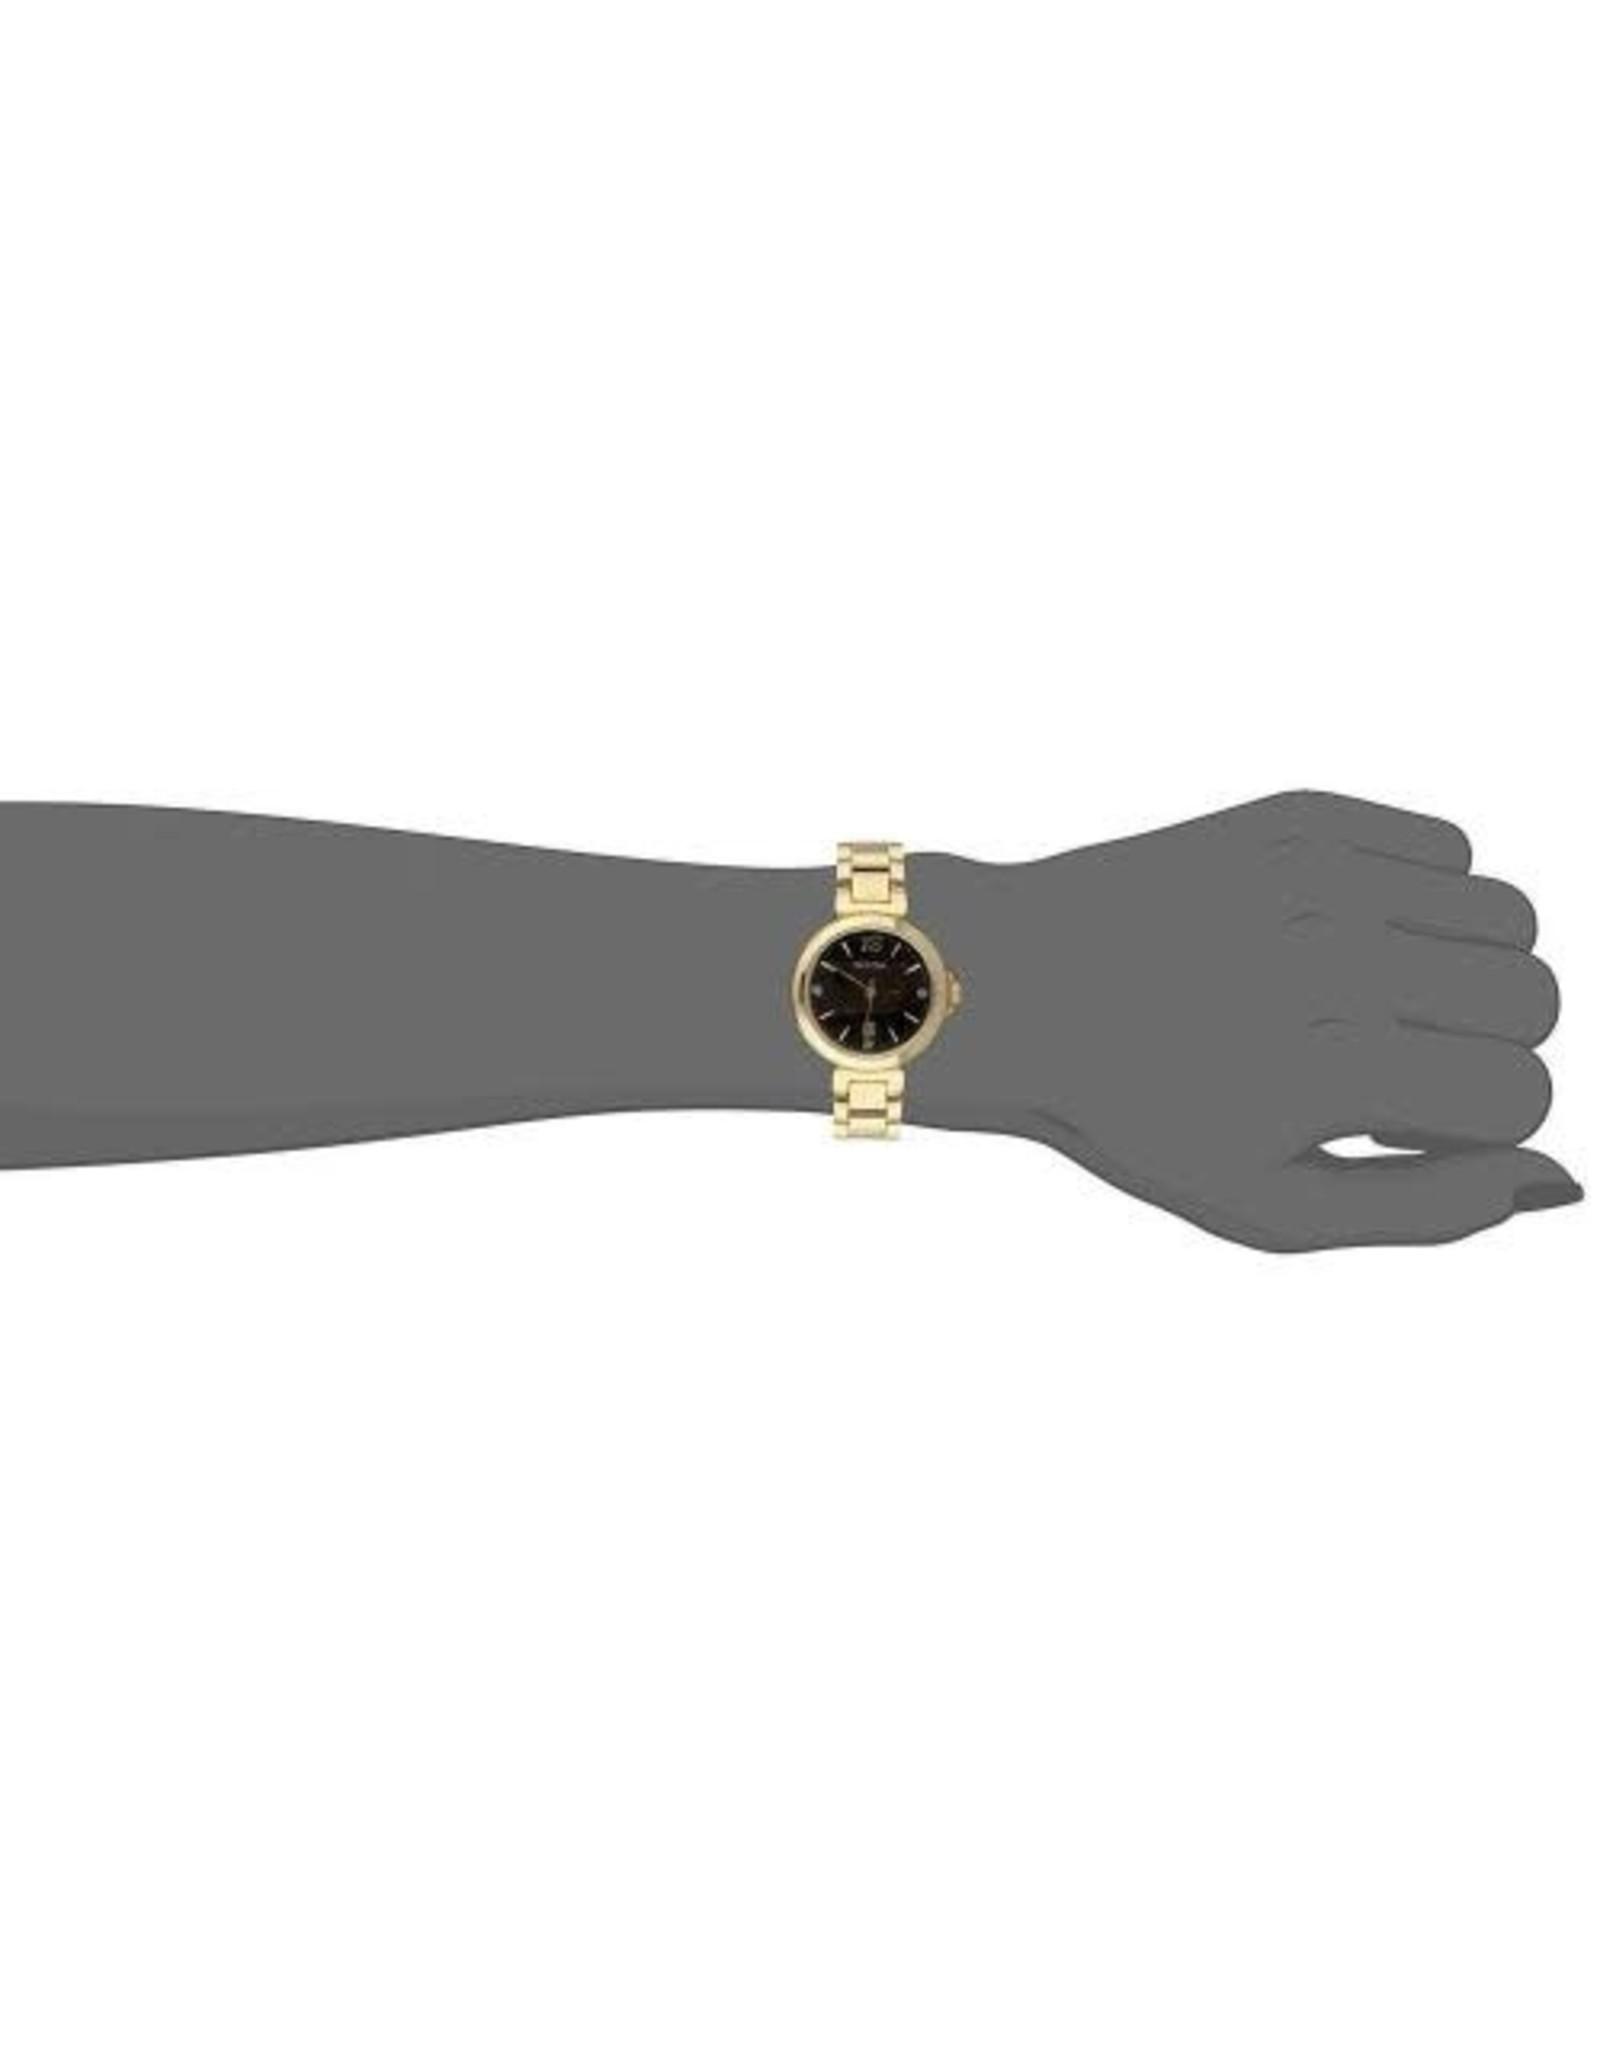 Ladies Bulova Diamond Accented Gold Tone Watch, 33mm